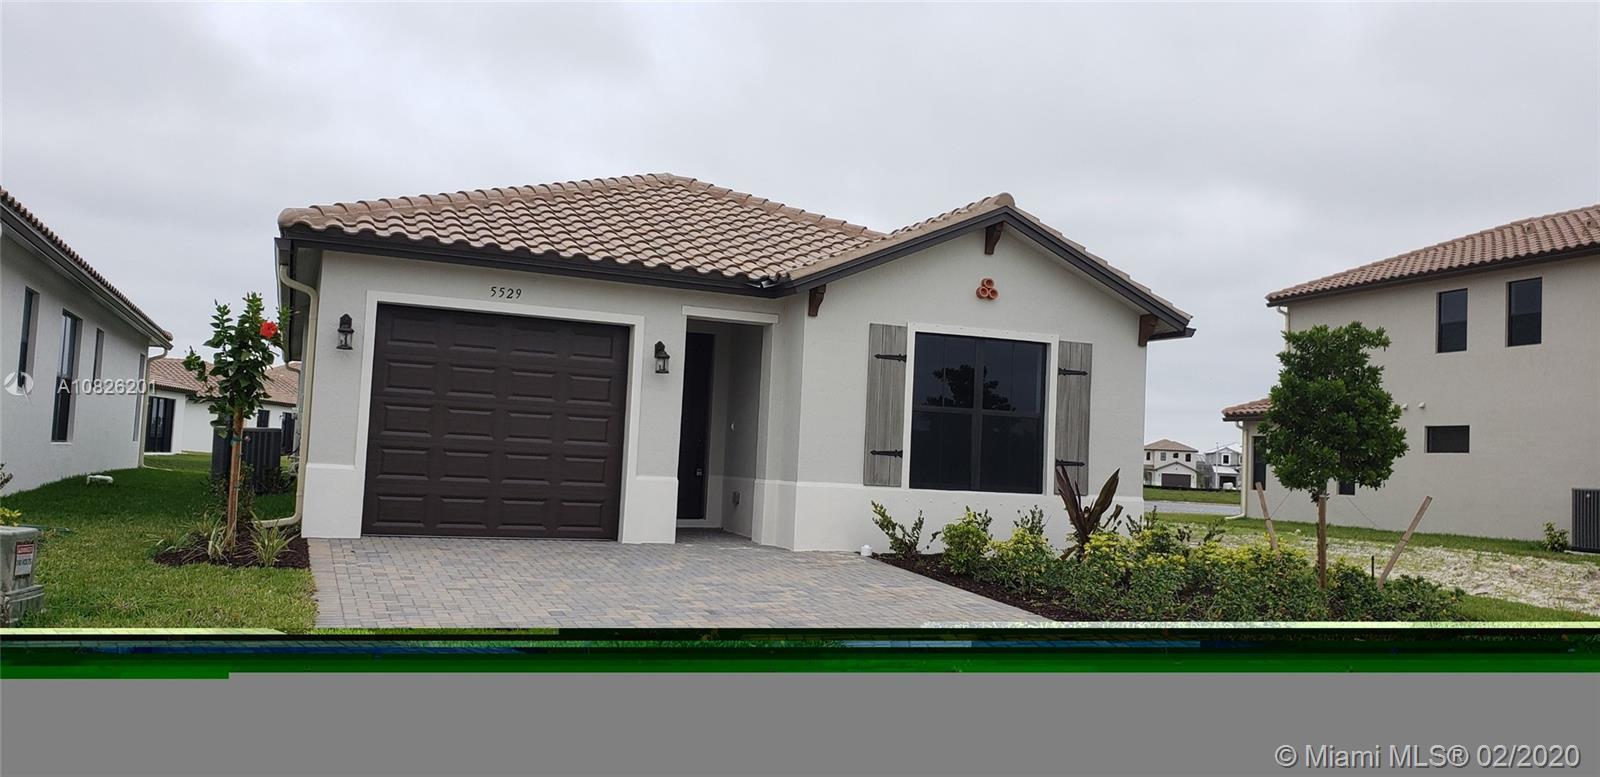 5529 S Soria Ave Property Photo - Ava Maria, FL real estate listing